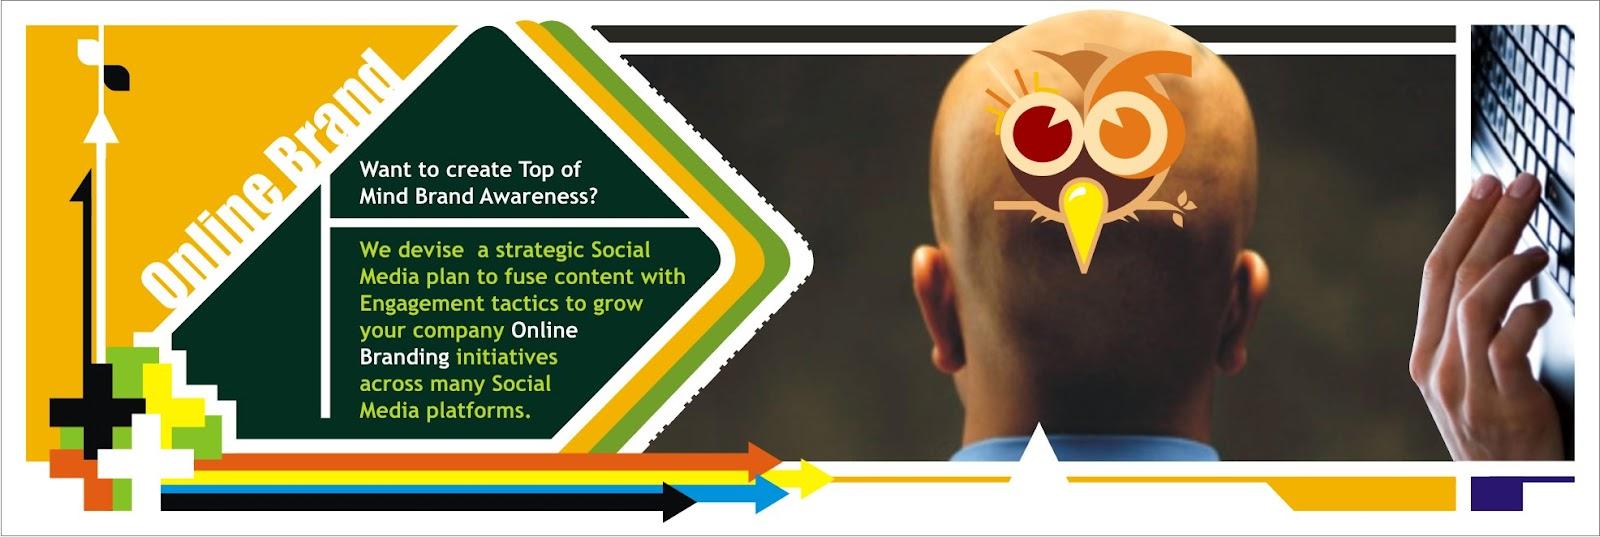 Kenya social media marketing agency kenyan professionals missing out on power of linkedin malvernweather Images